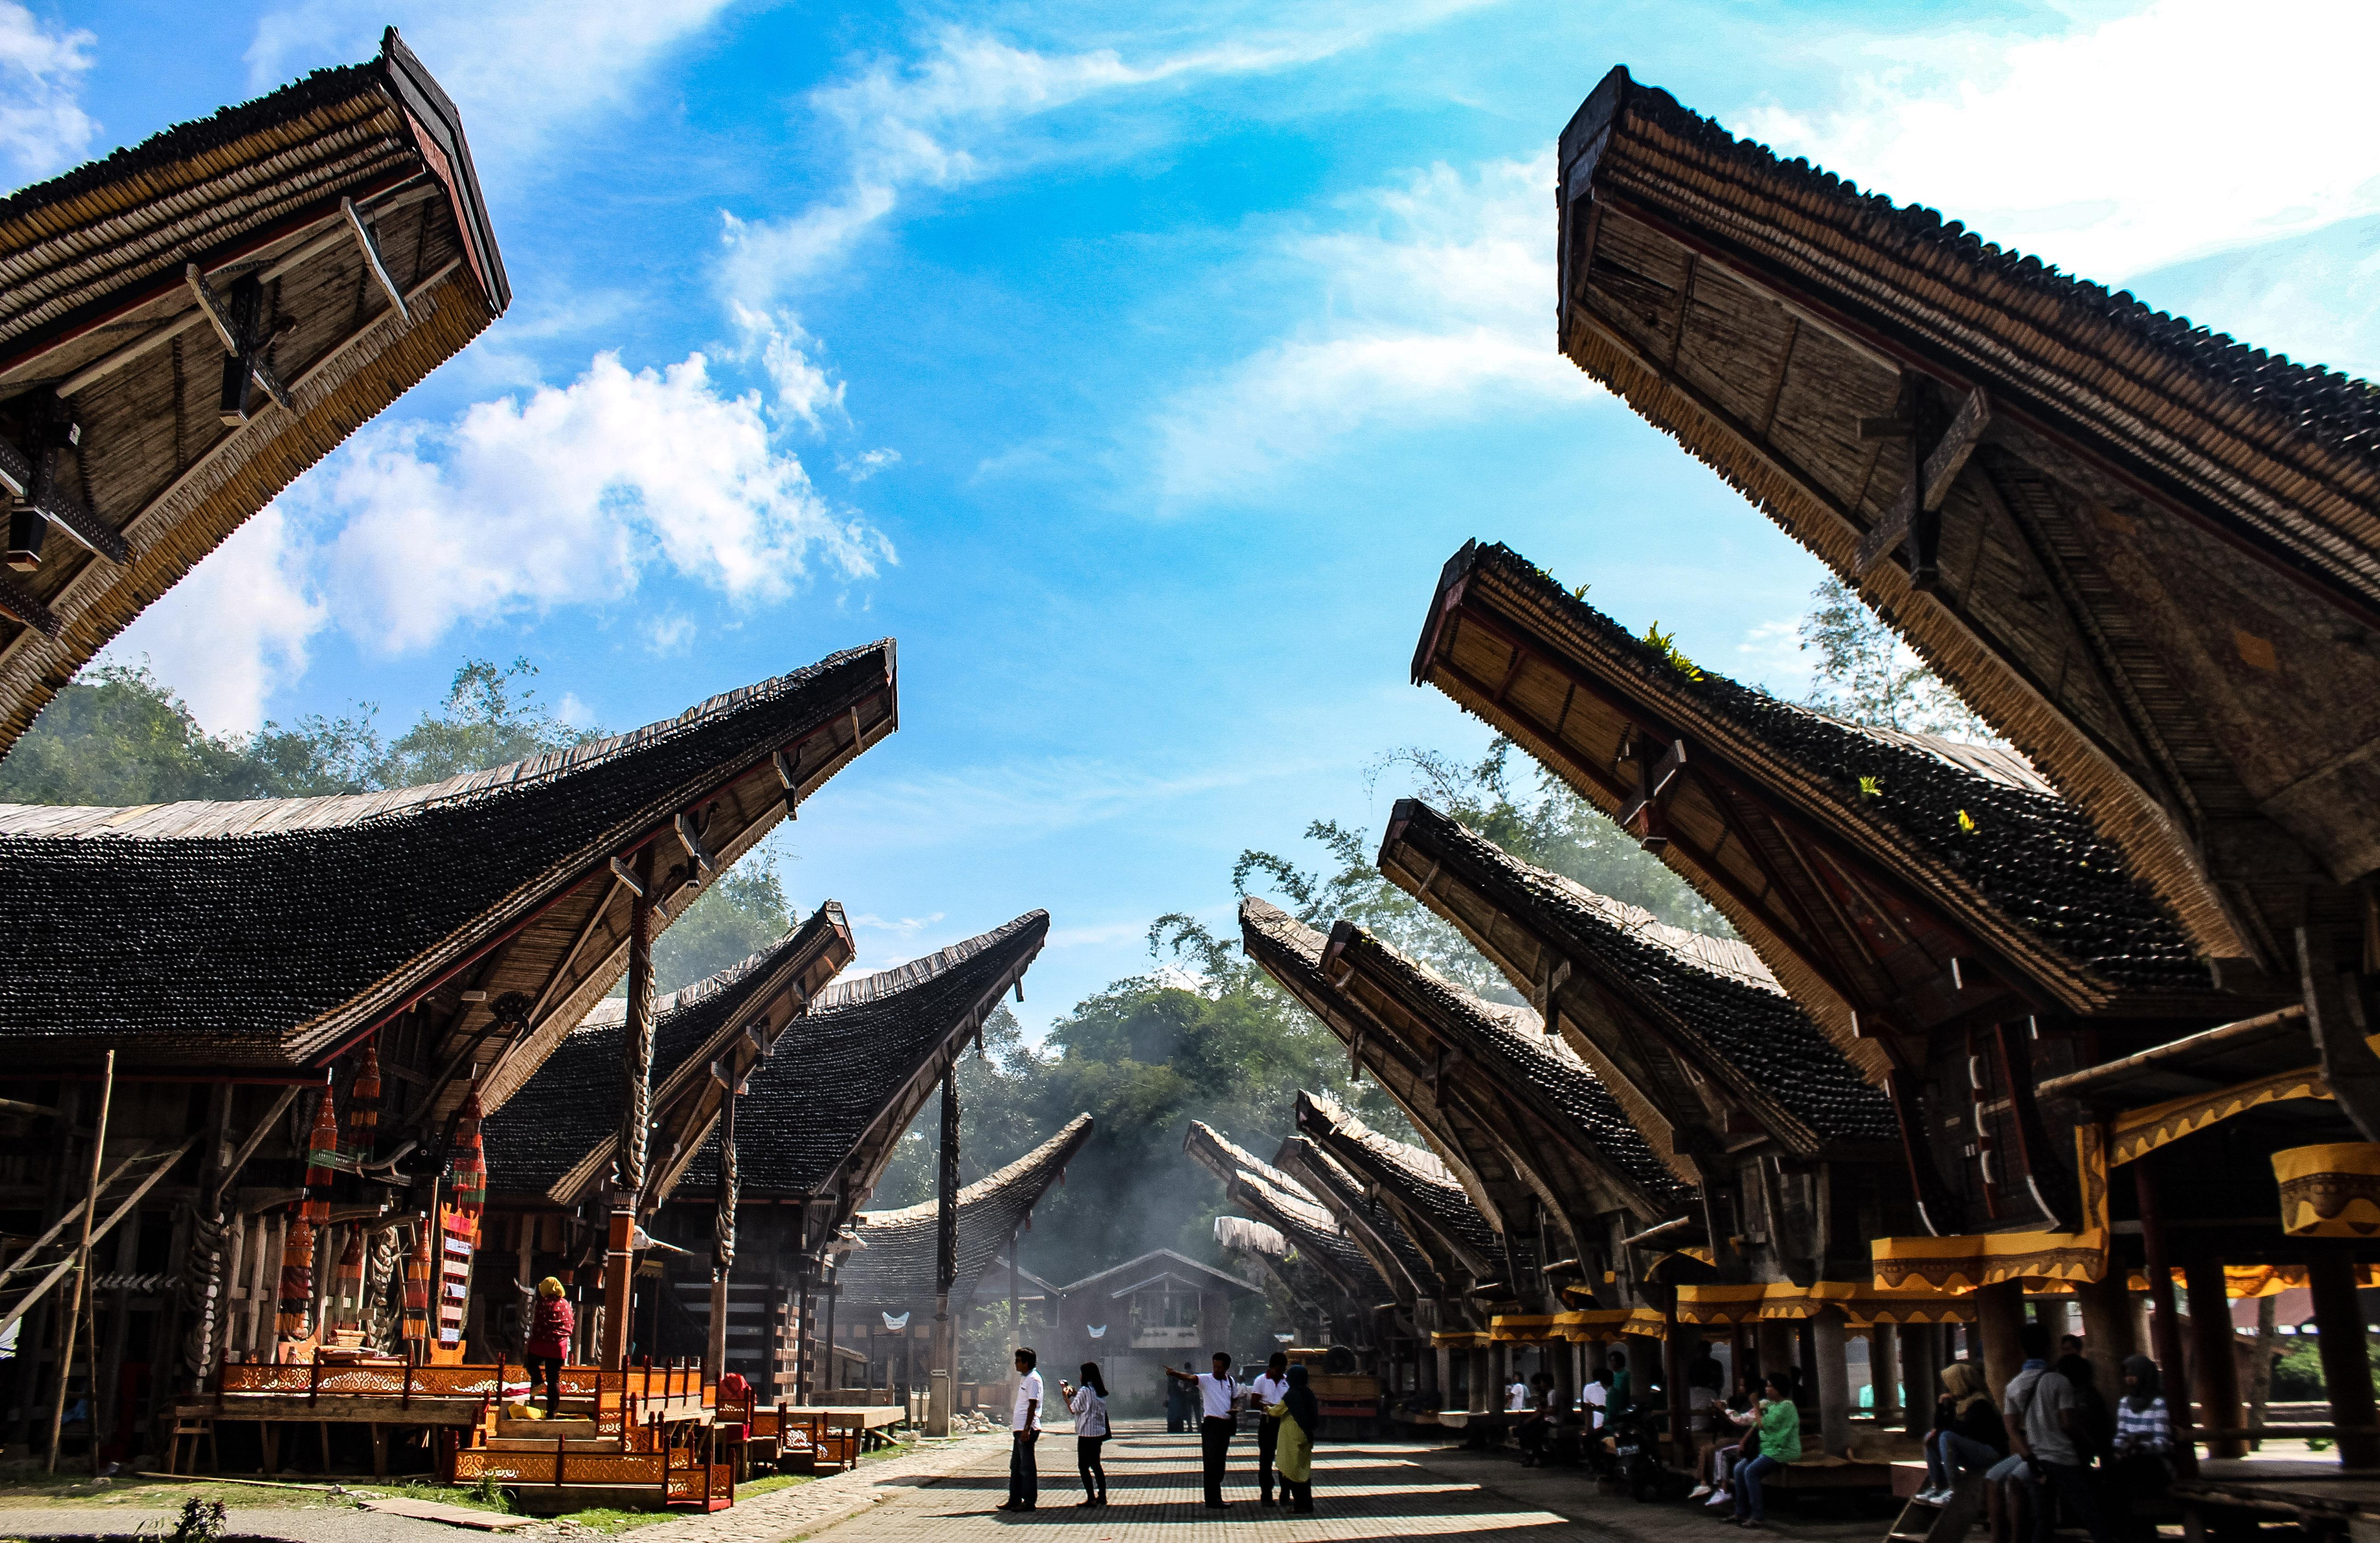 Tana Toraja, Sulawesi Selatan, Kete Kesu Toraja, Toraja Utara, Tongkonan, Rumah Adat Masyarakat Toraja,